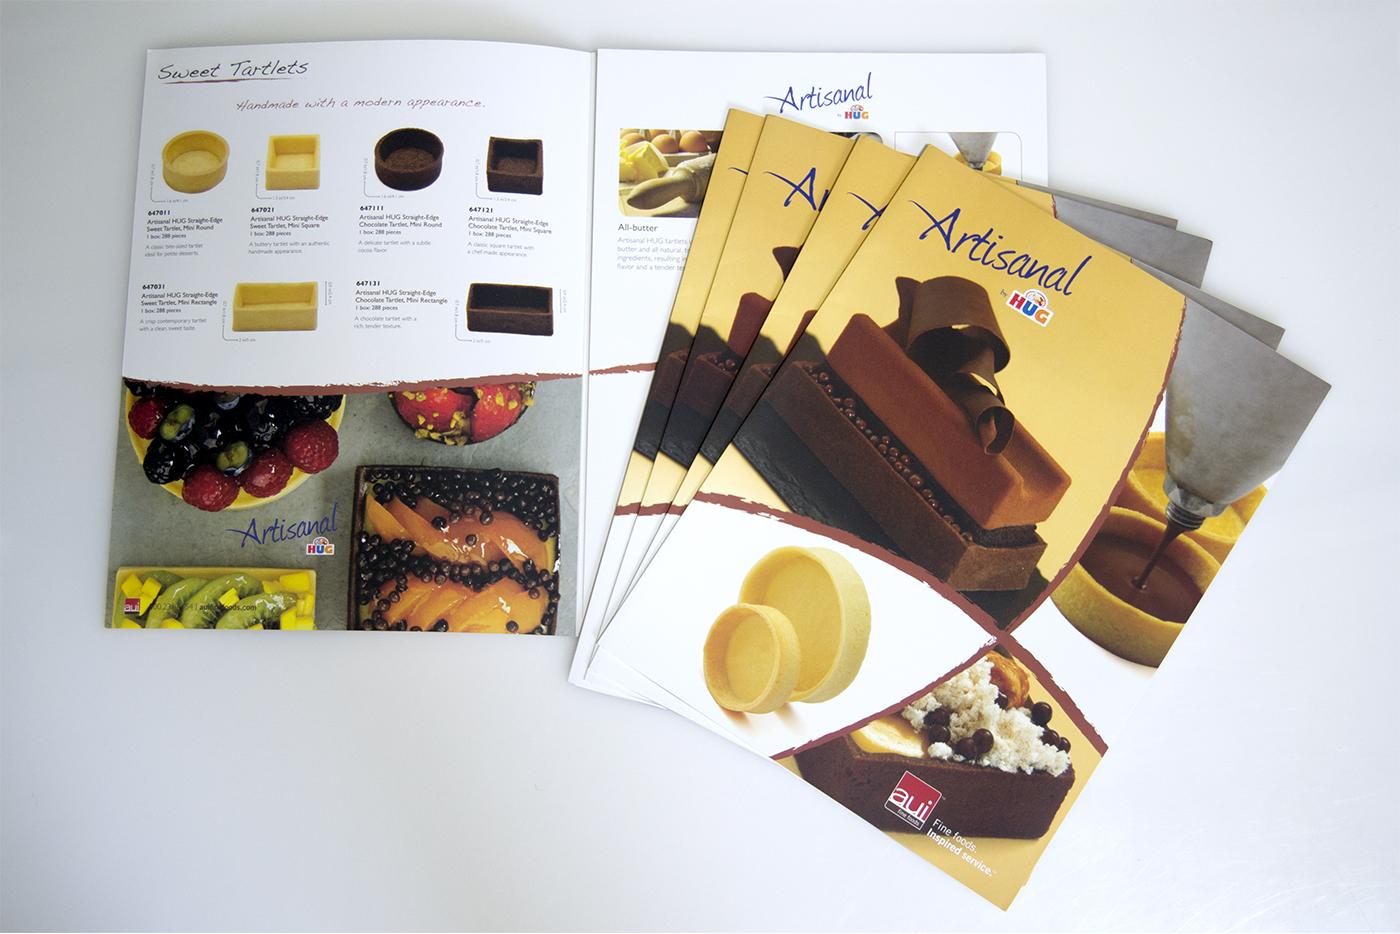 catalogs_0011_dsc_0230